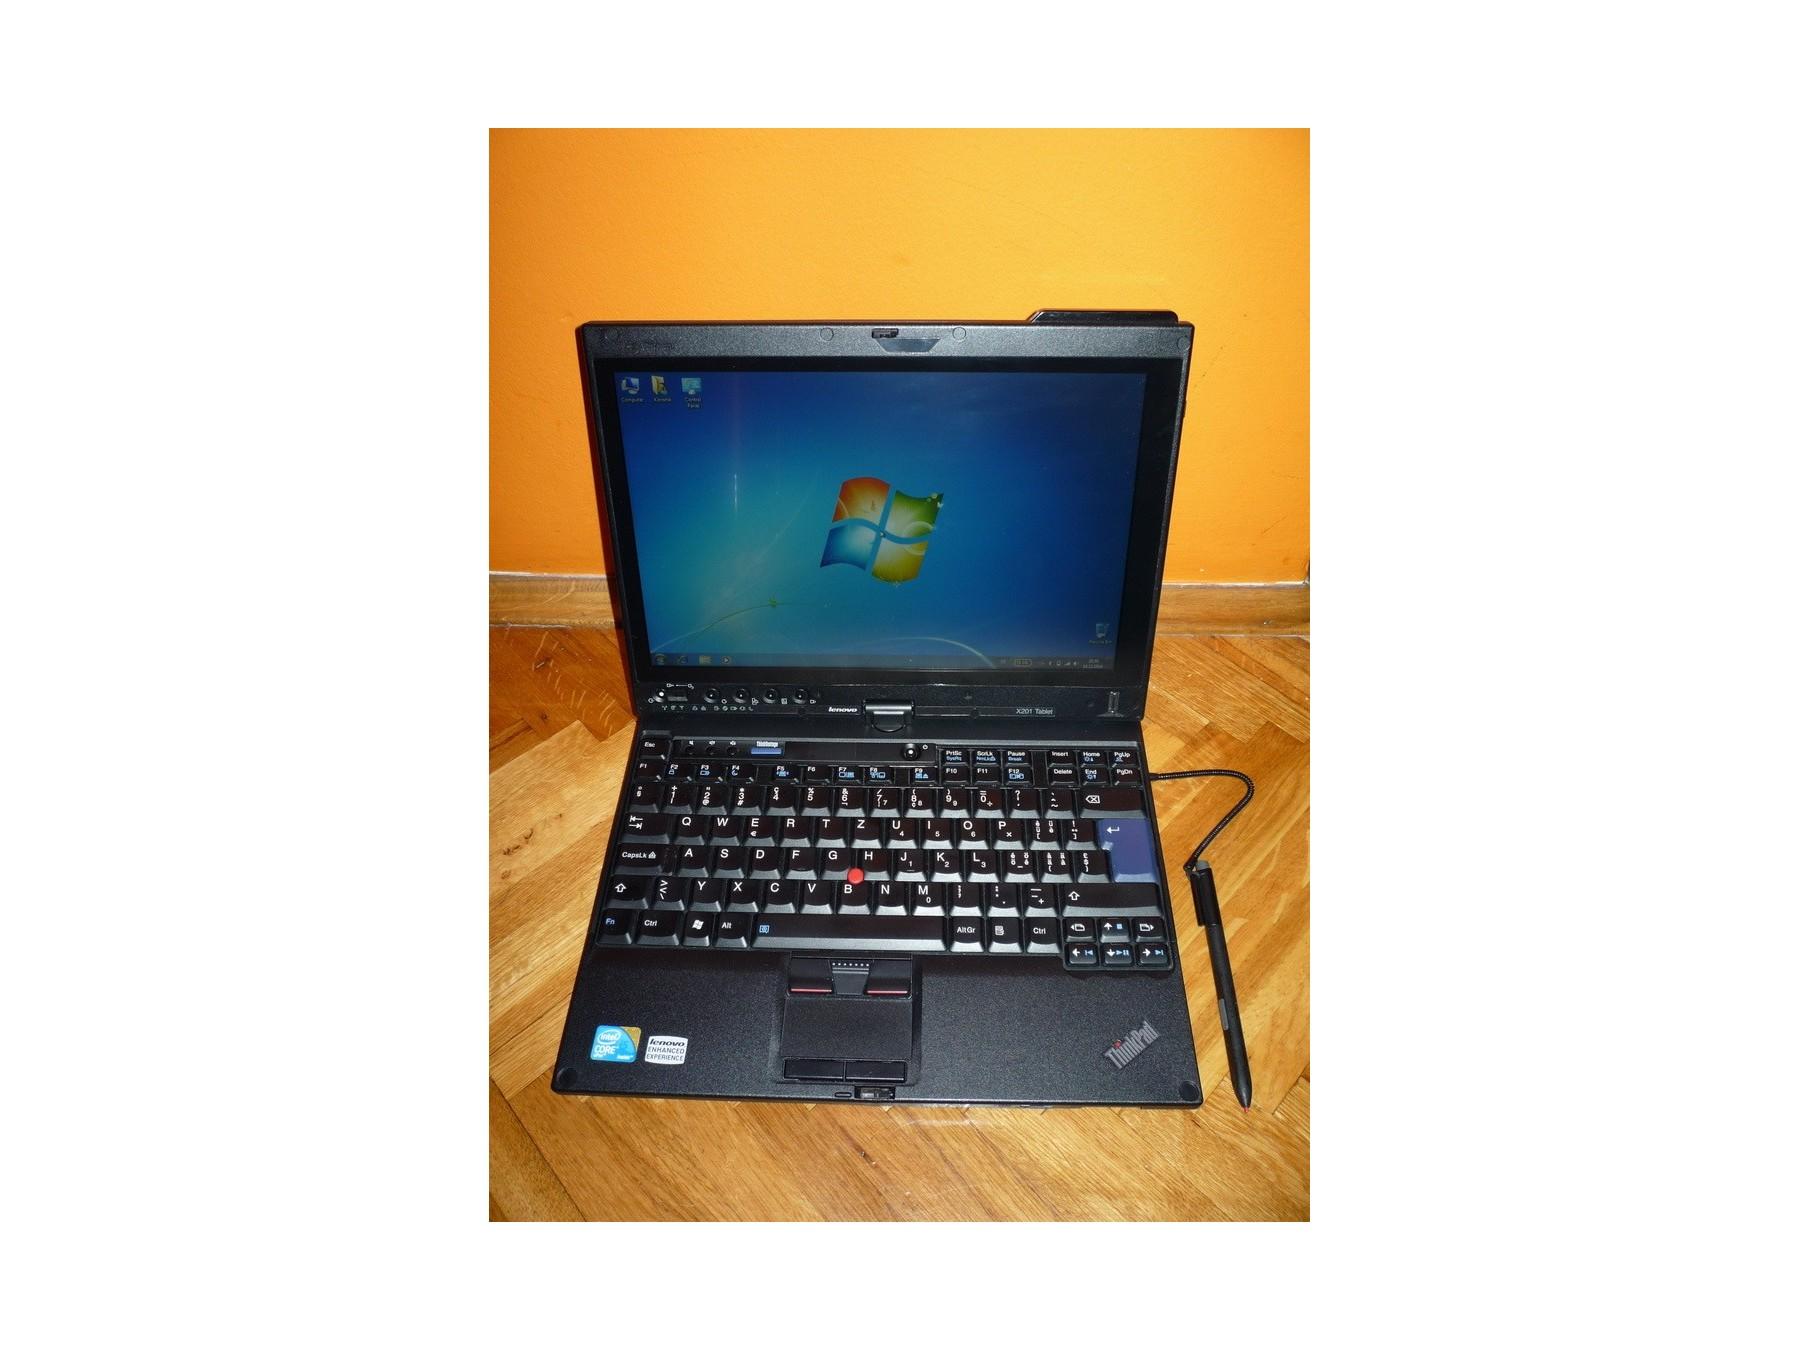 Lenovo ThinkPad X201 Tablet i5 4Gb DDR3 250Gb TOP